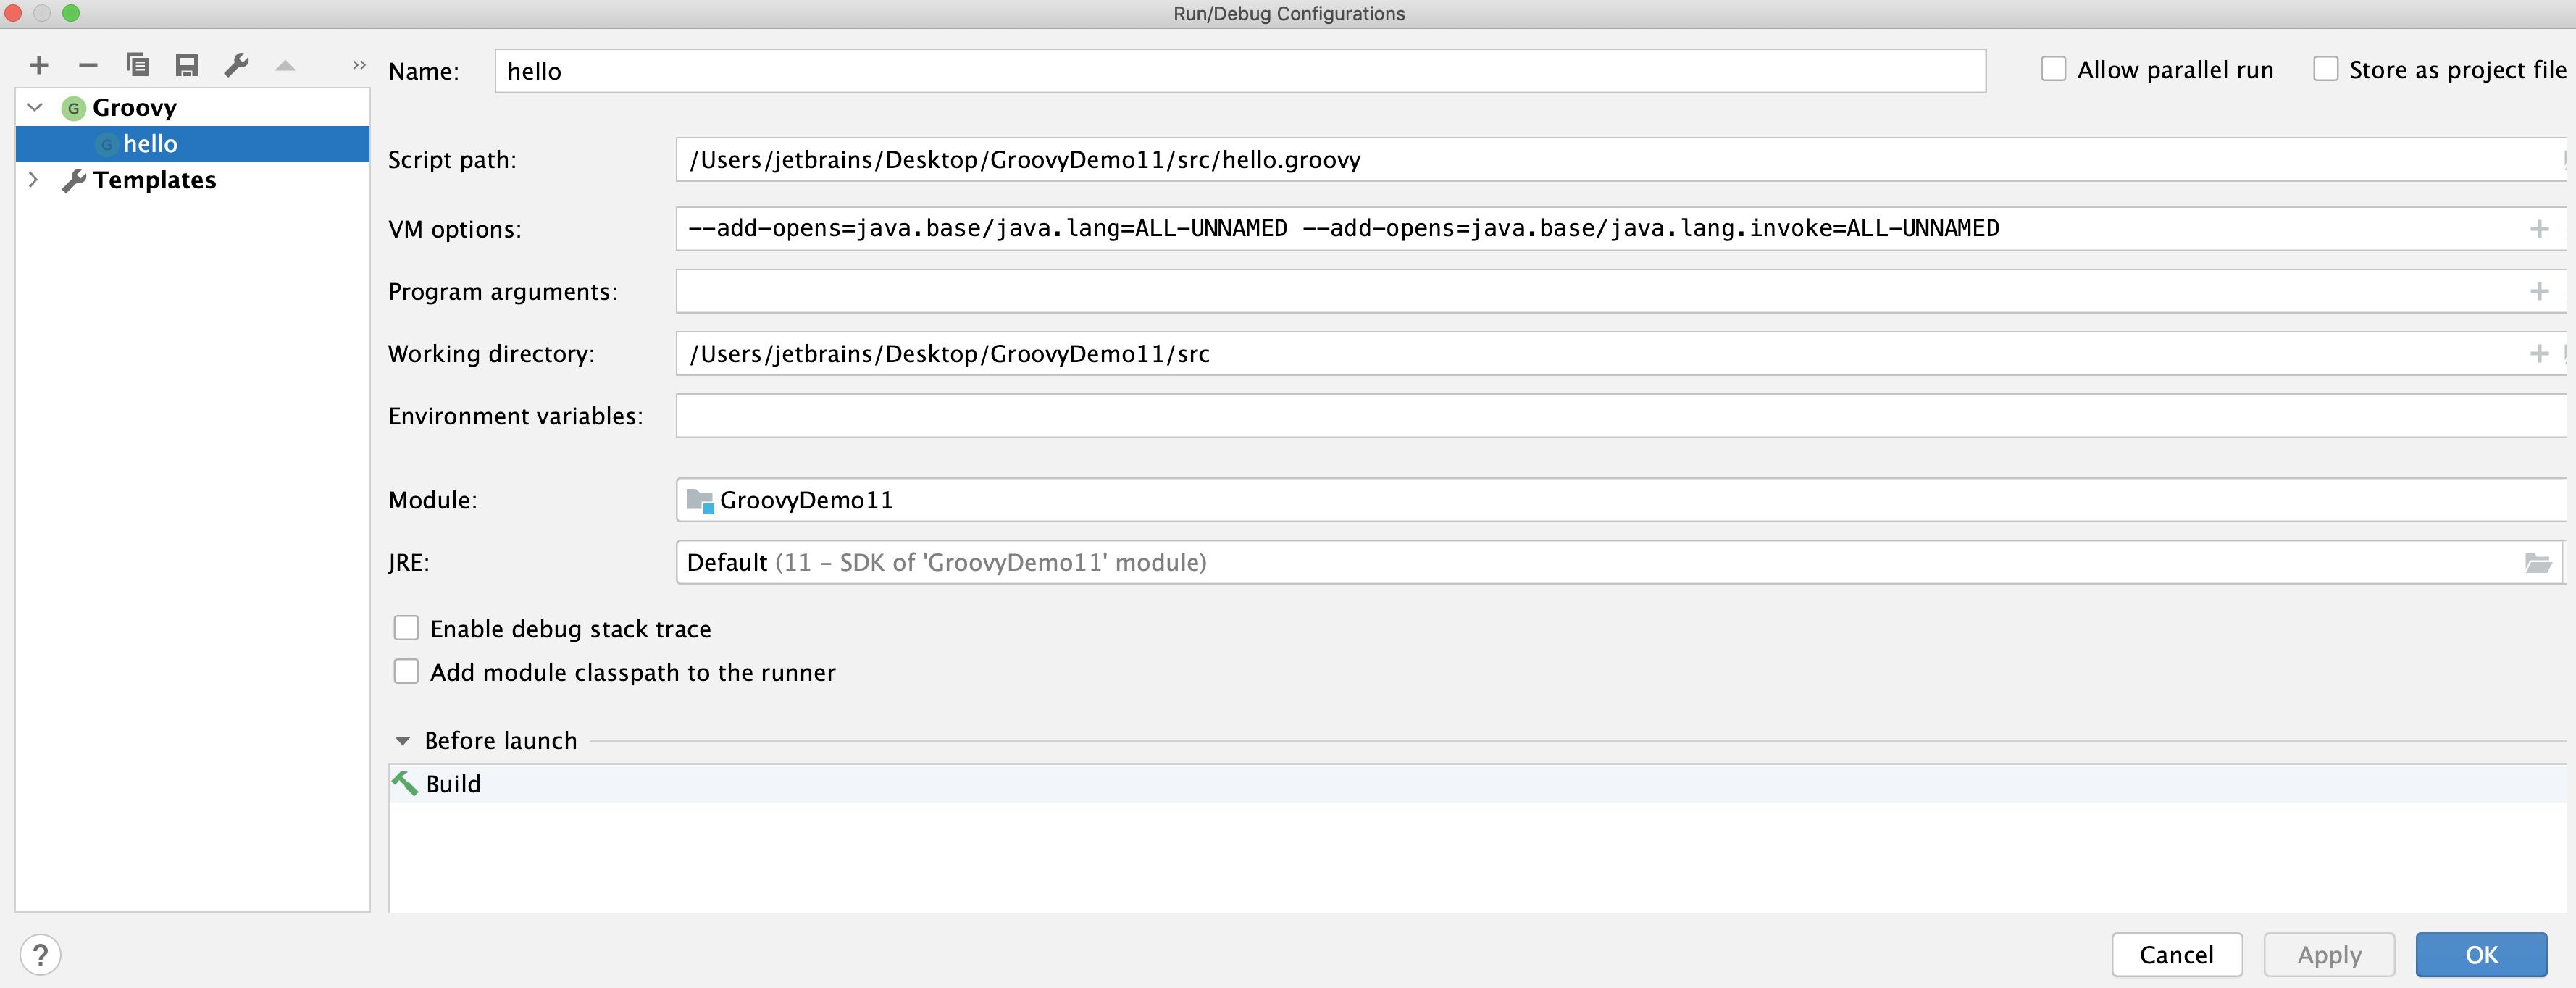 Groovy run configuration dialog